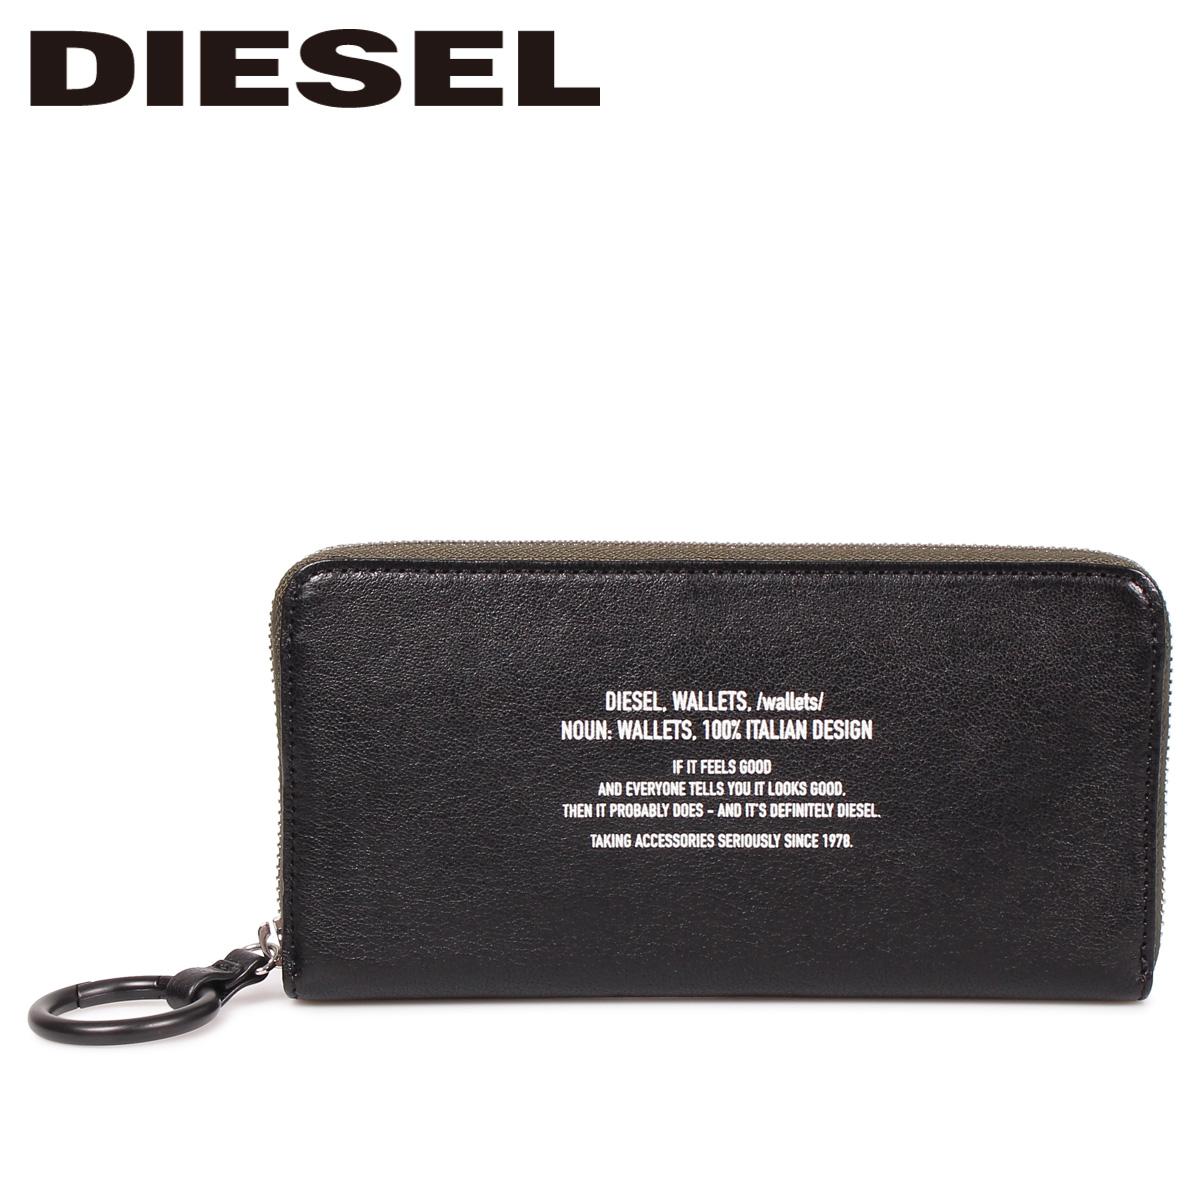 DIESEL BANDER 24 ZIP ディーゼル 財布 長財布 メンズ ラウンドファスナー 本革 ブラック 黒 X06296 PS142